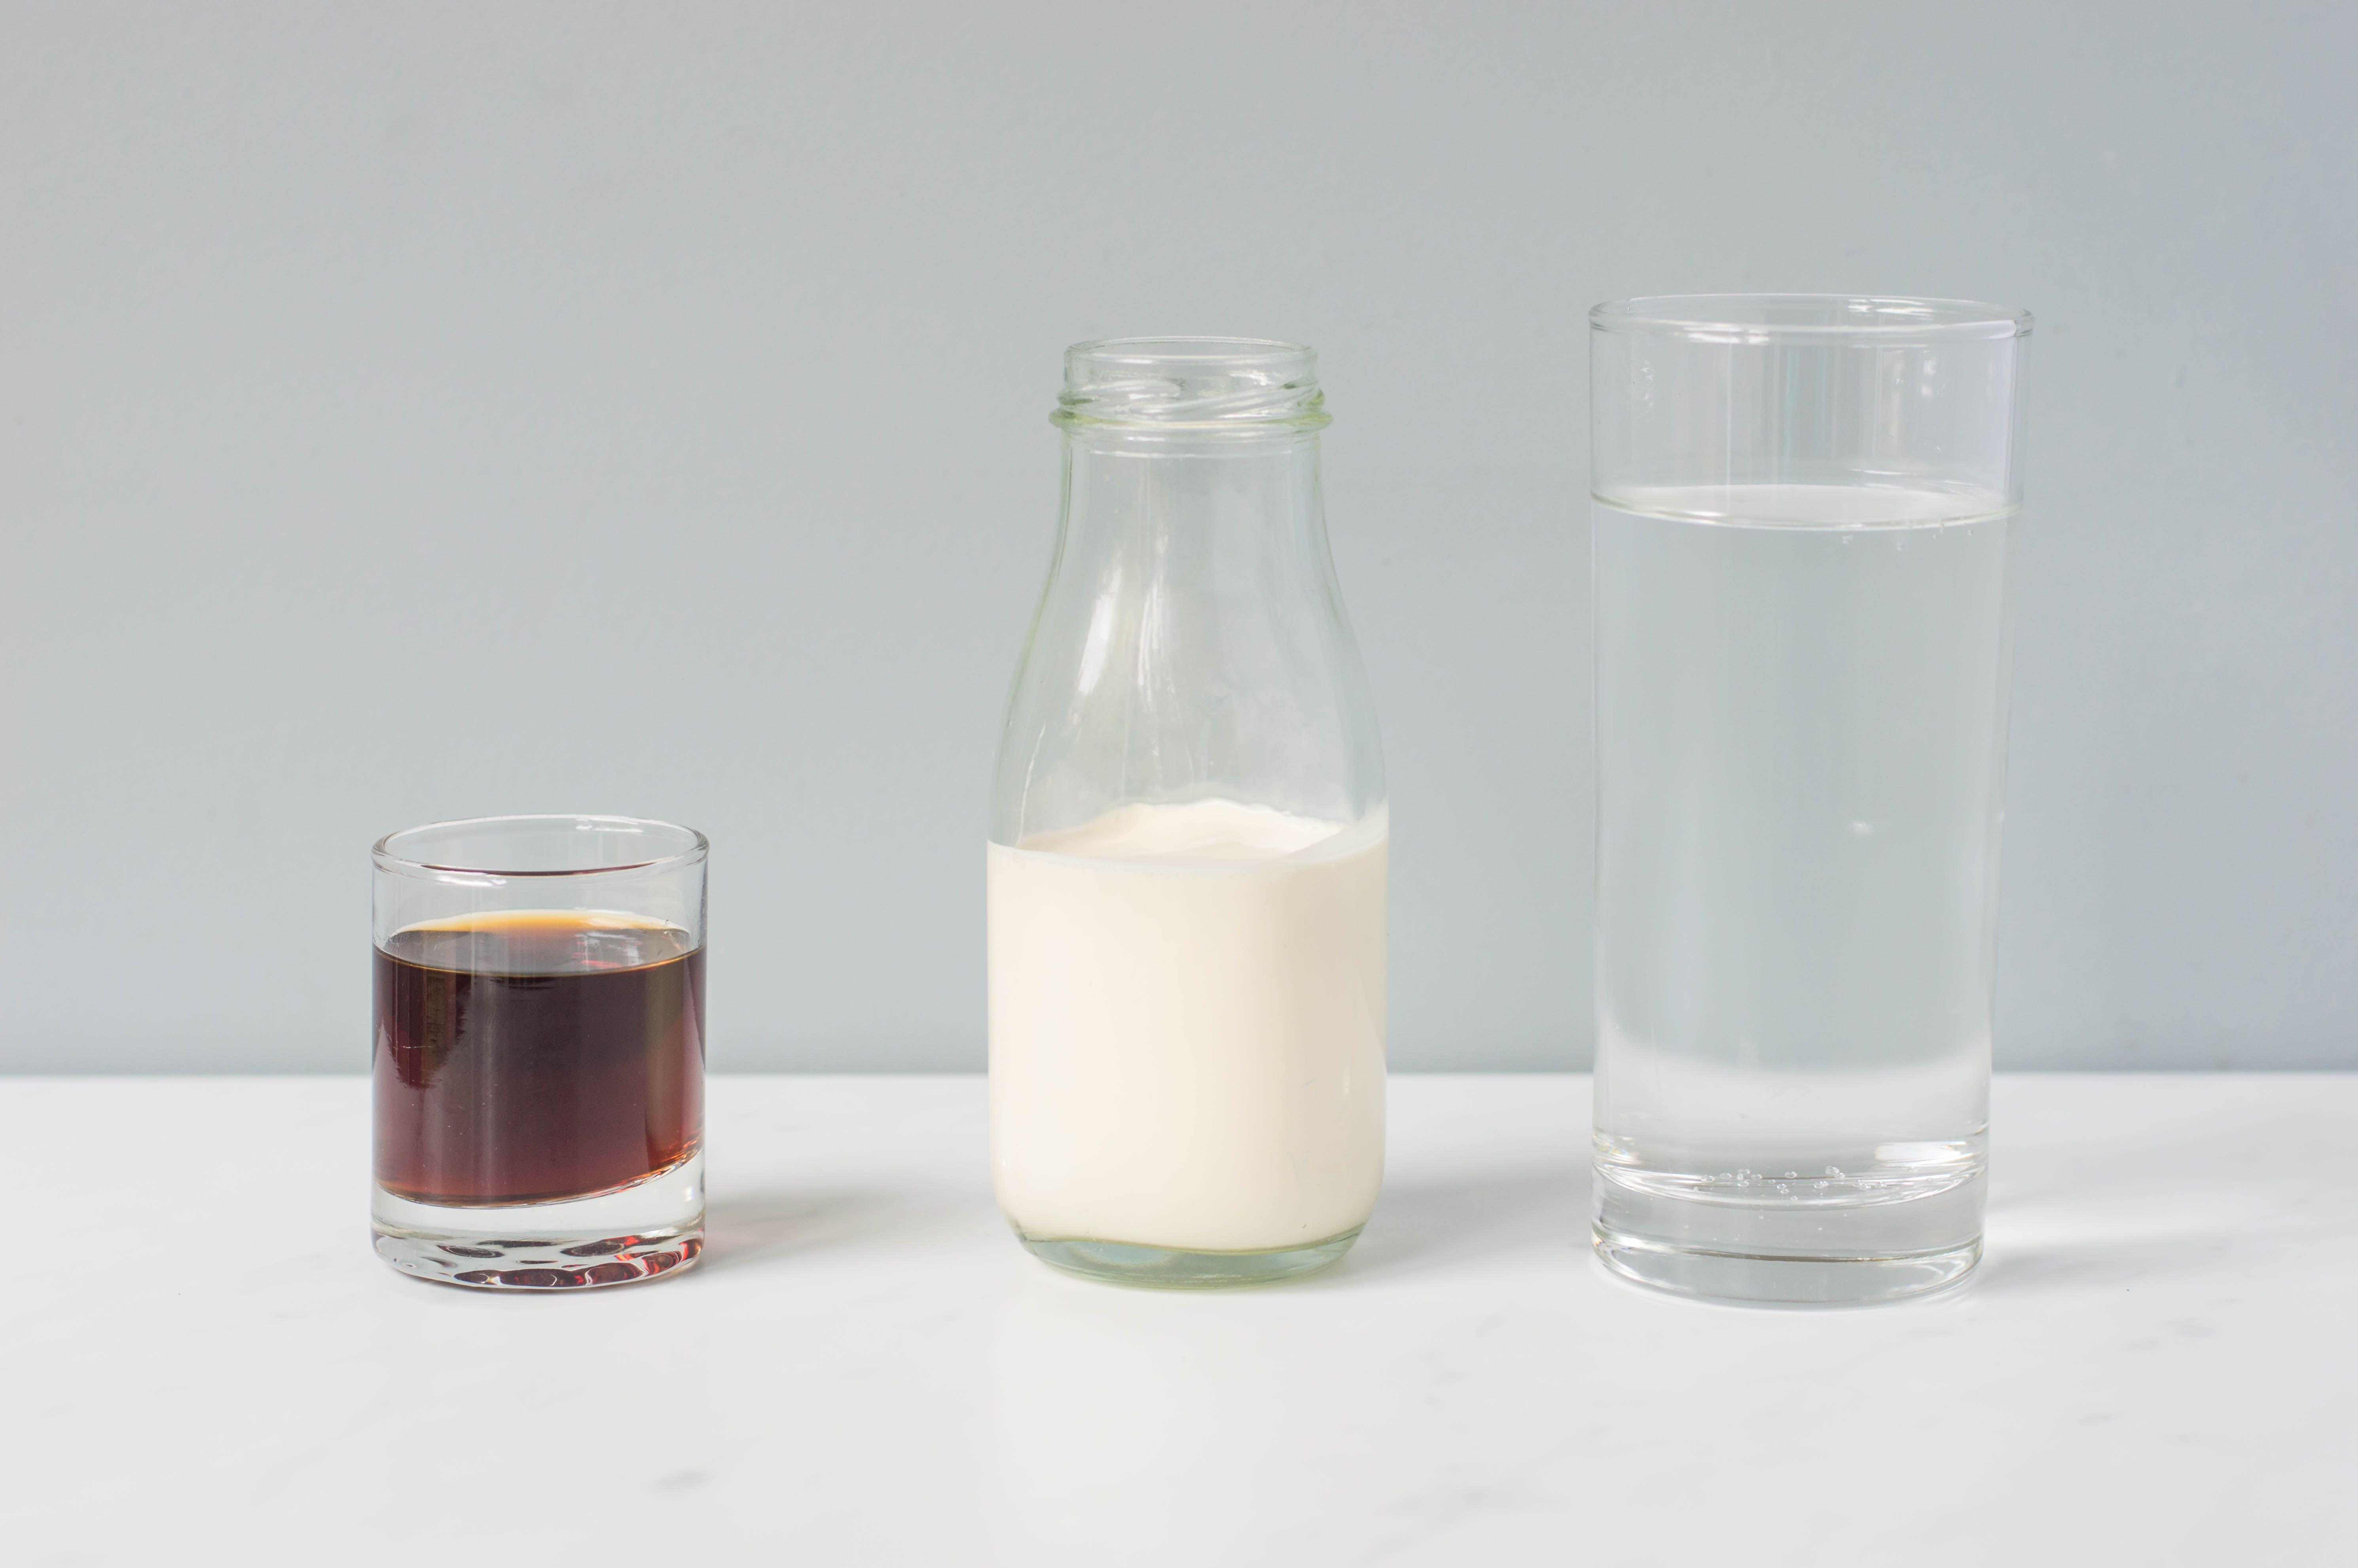 Smith & Kearns Recipe ingredients